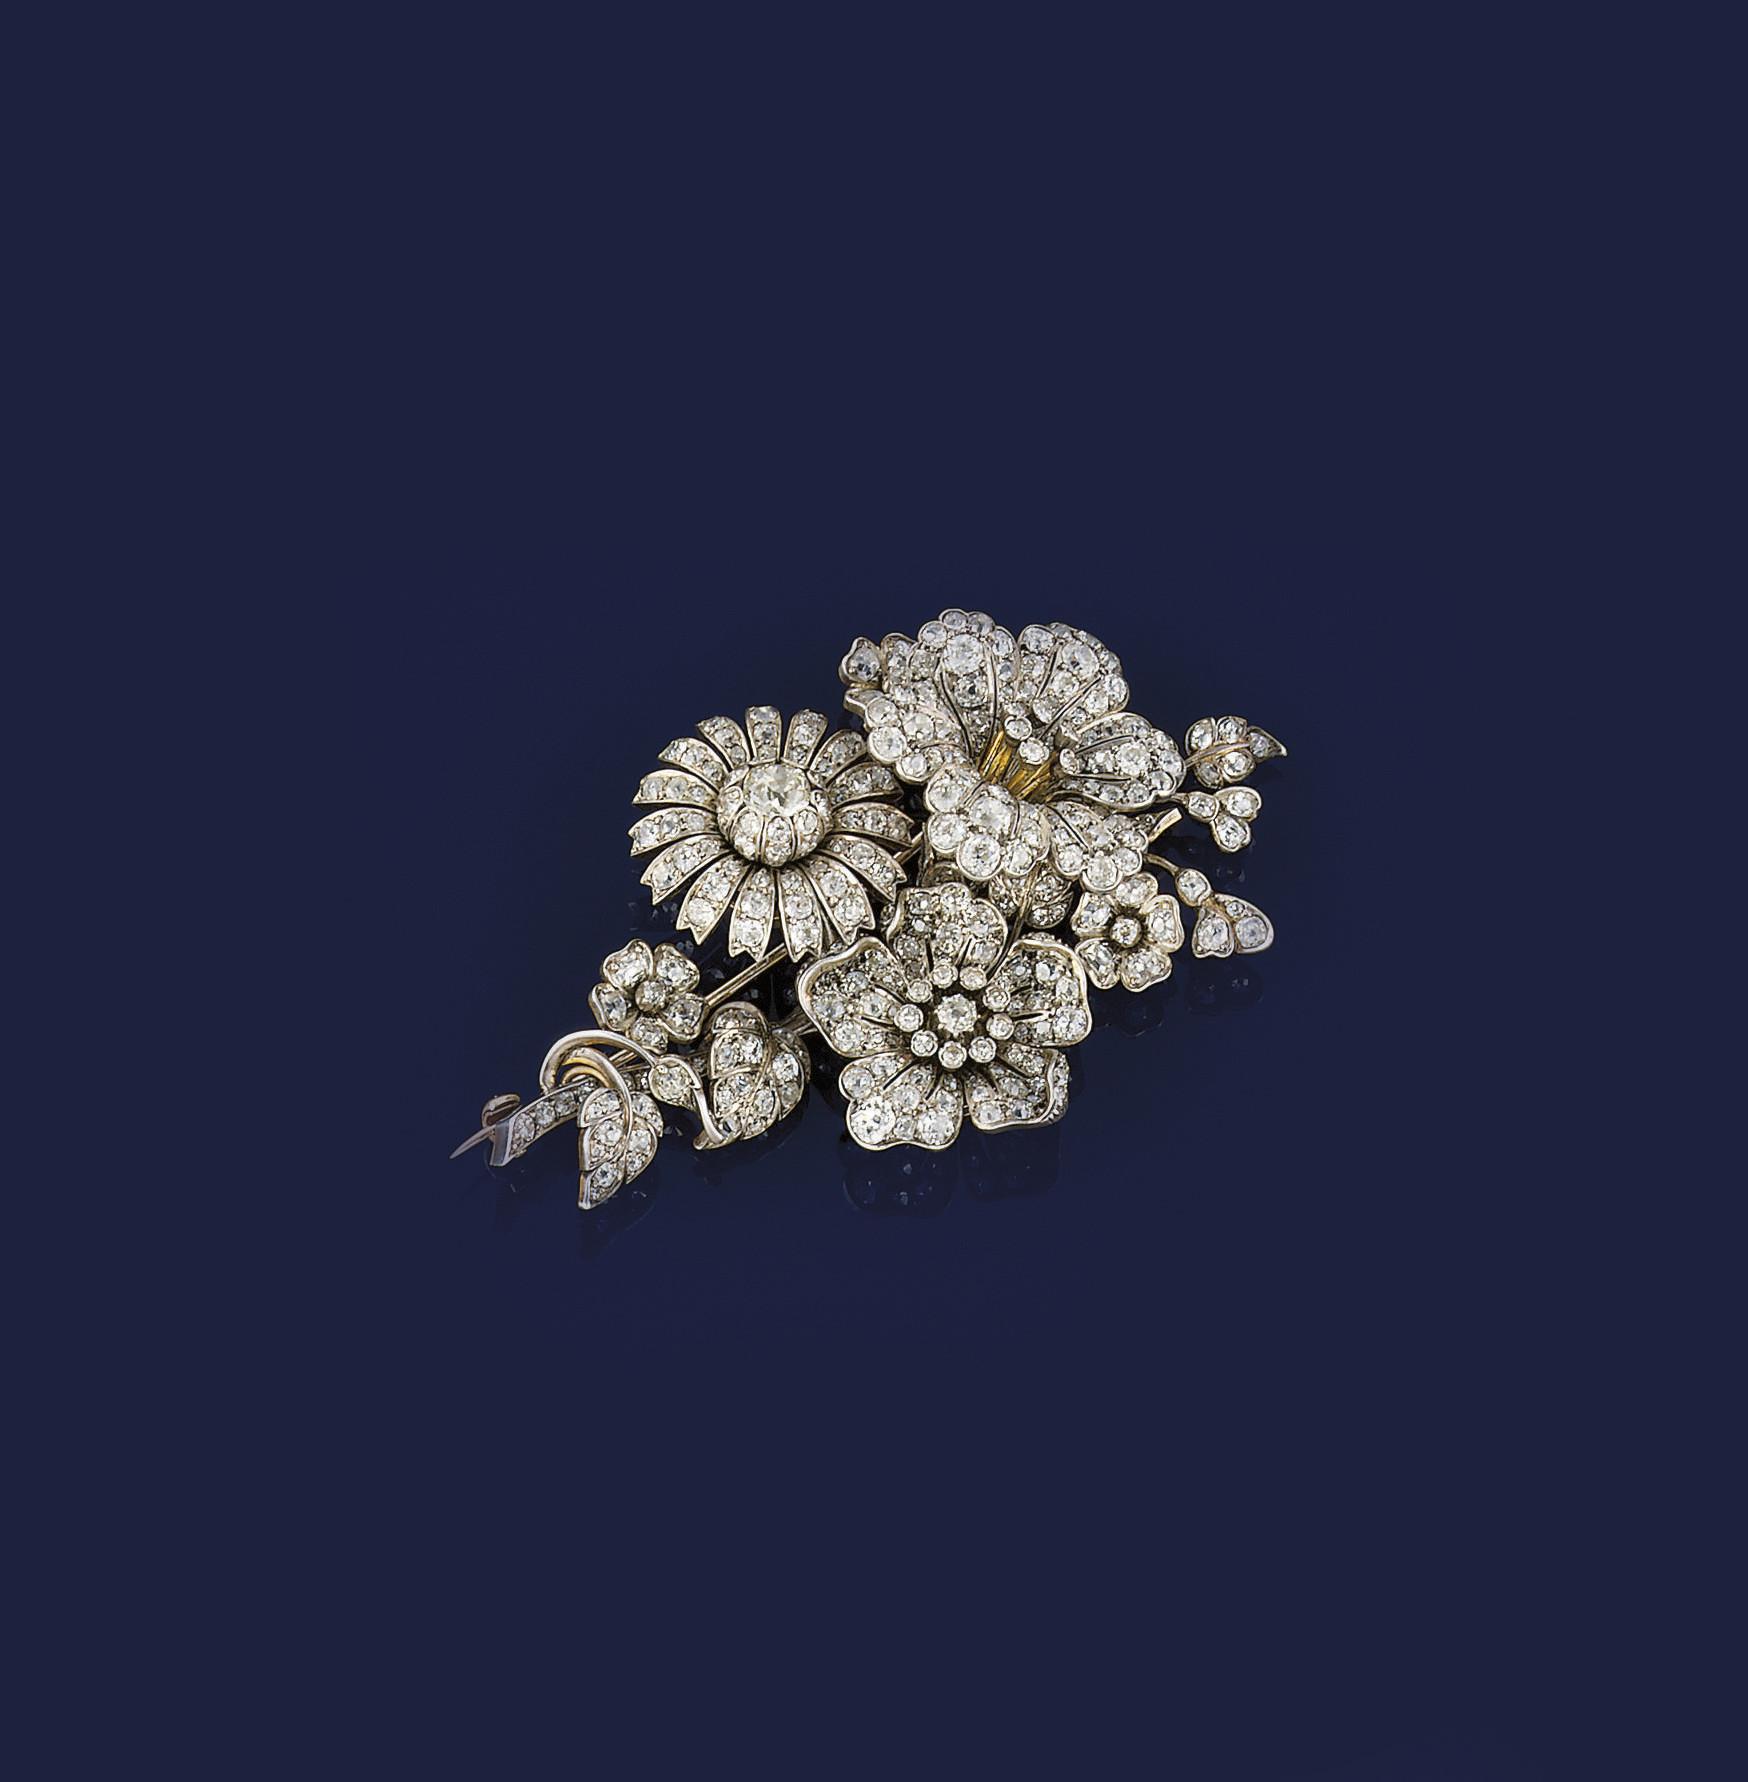 A 19th century diamond floral